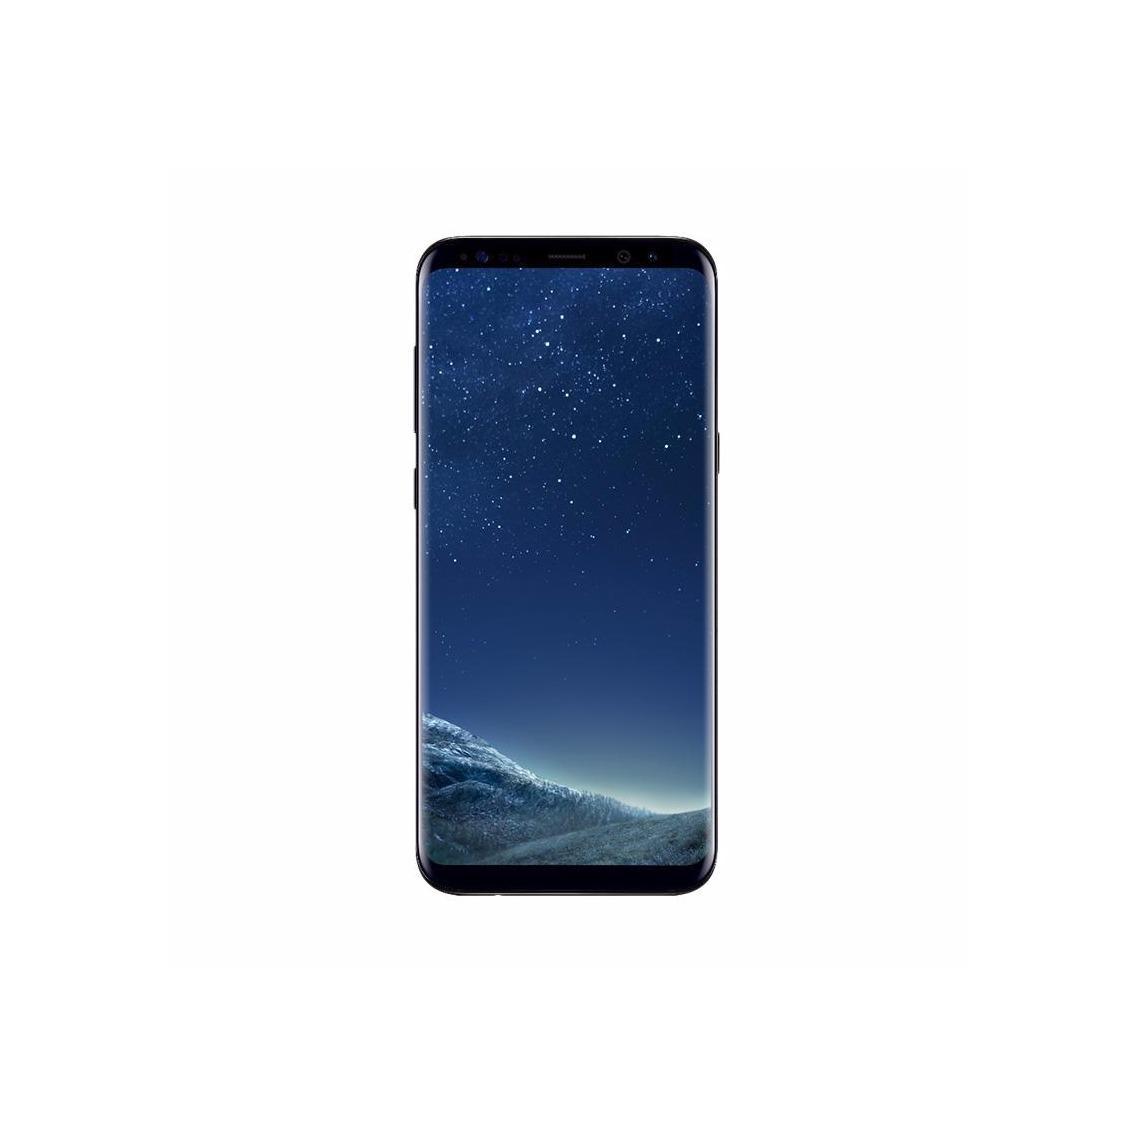 Samsung Galaxy S8 Plus Smartphone - Black [64GB/4GB